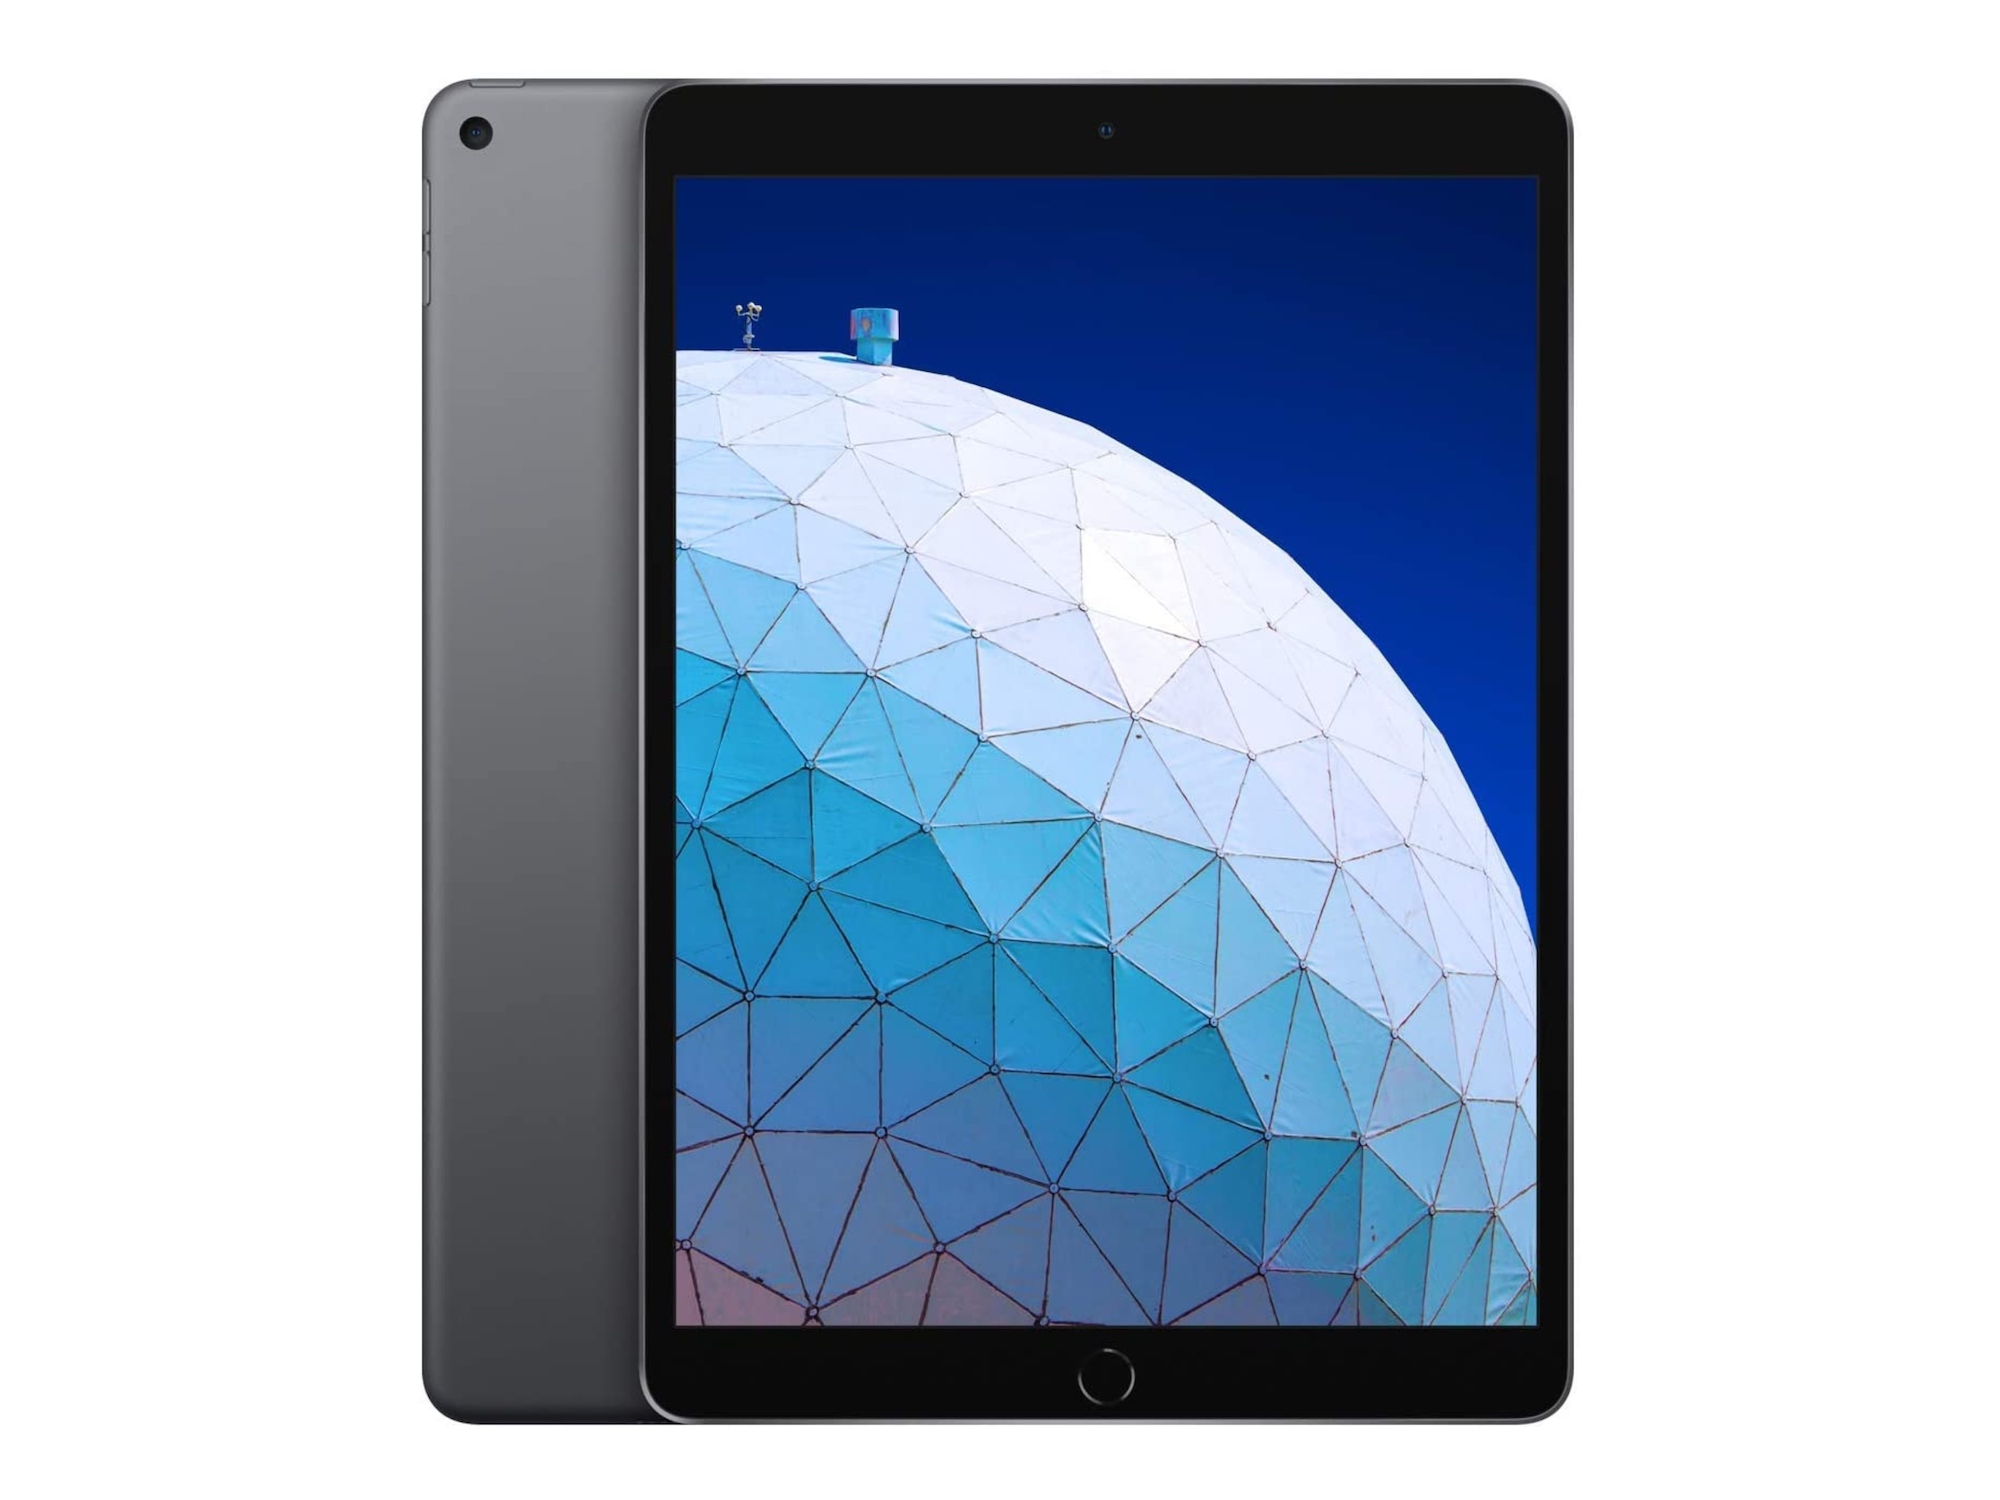 Offerte Amazon Prime Day: risparmia £ 66 su un Apple iPad Air